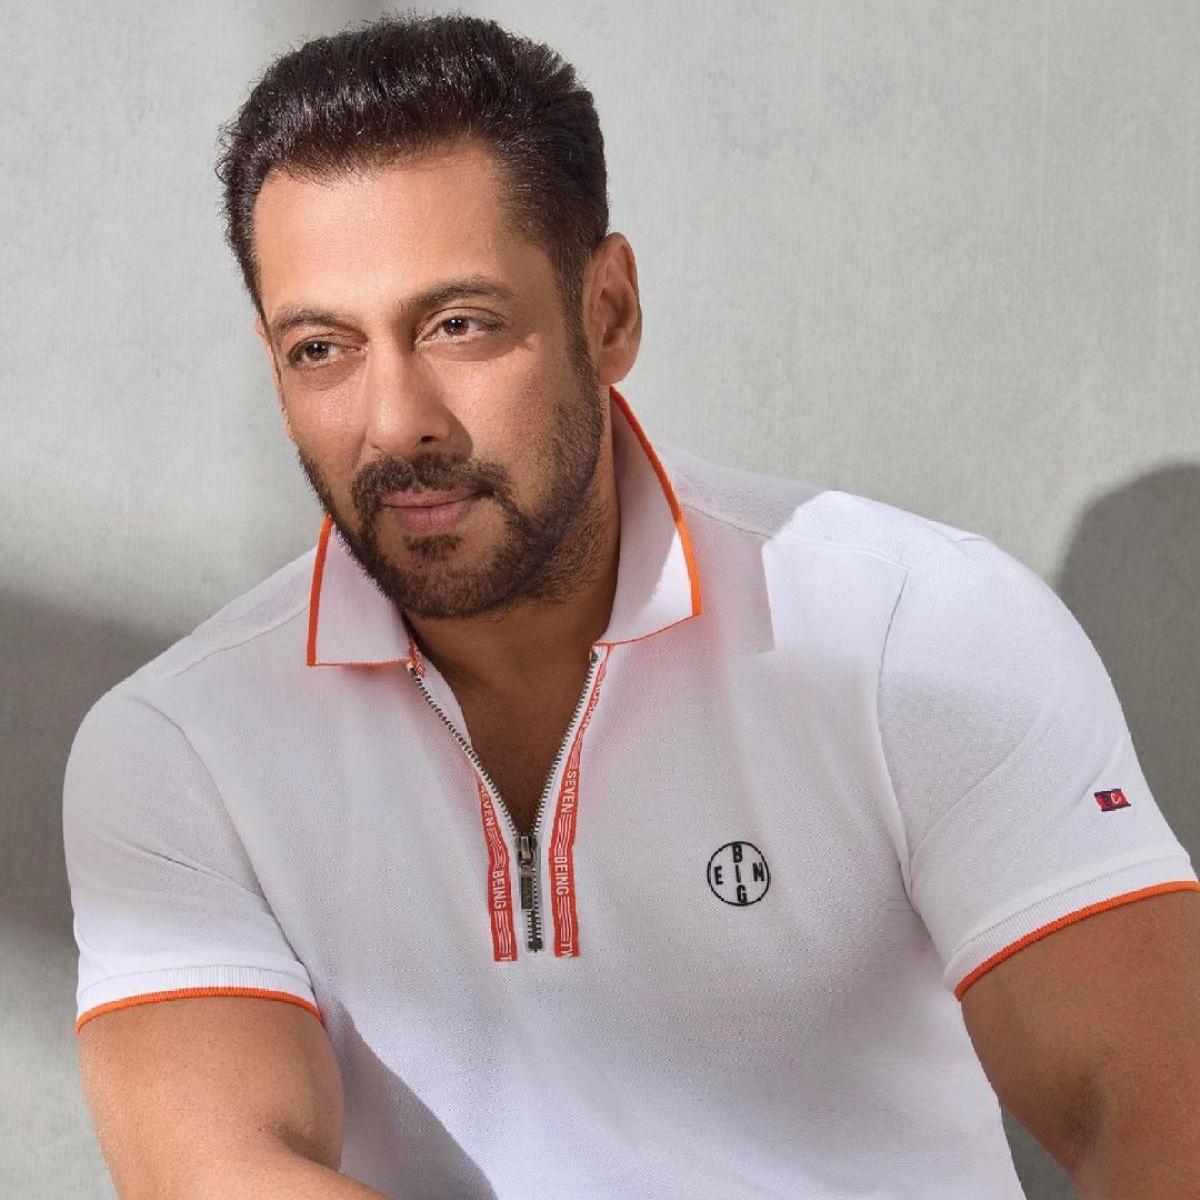 Salman Khan to provide financial aid to 25,000 cine workers amod COVID-19 crisis